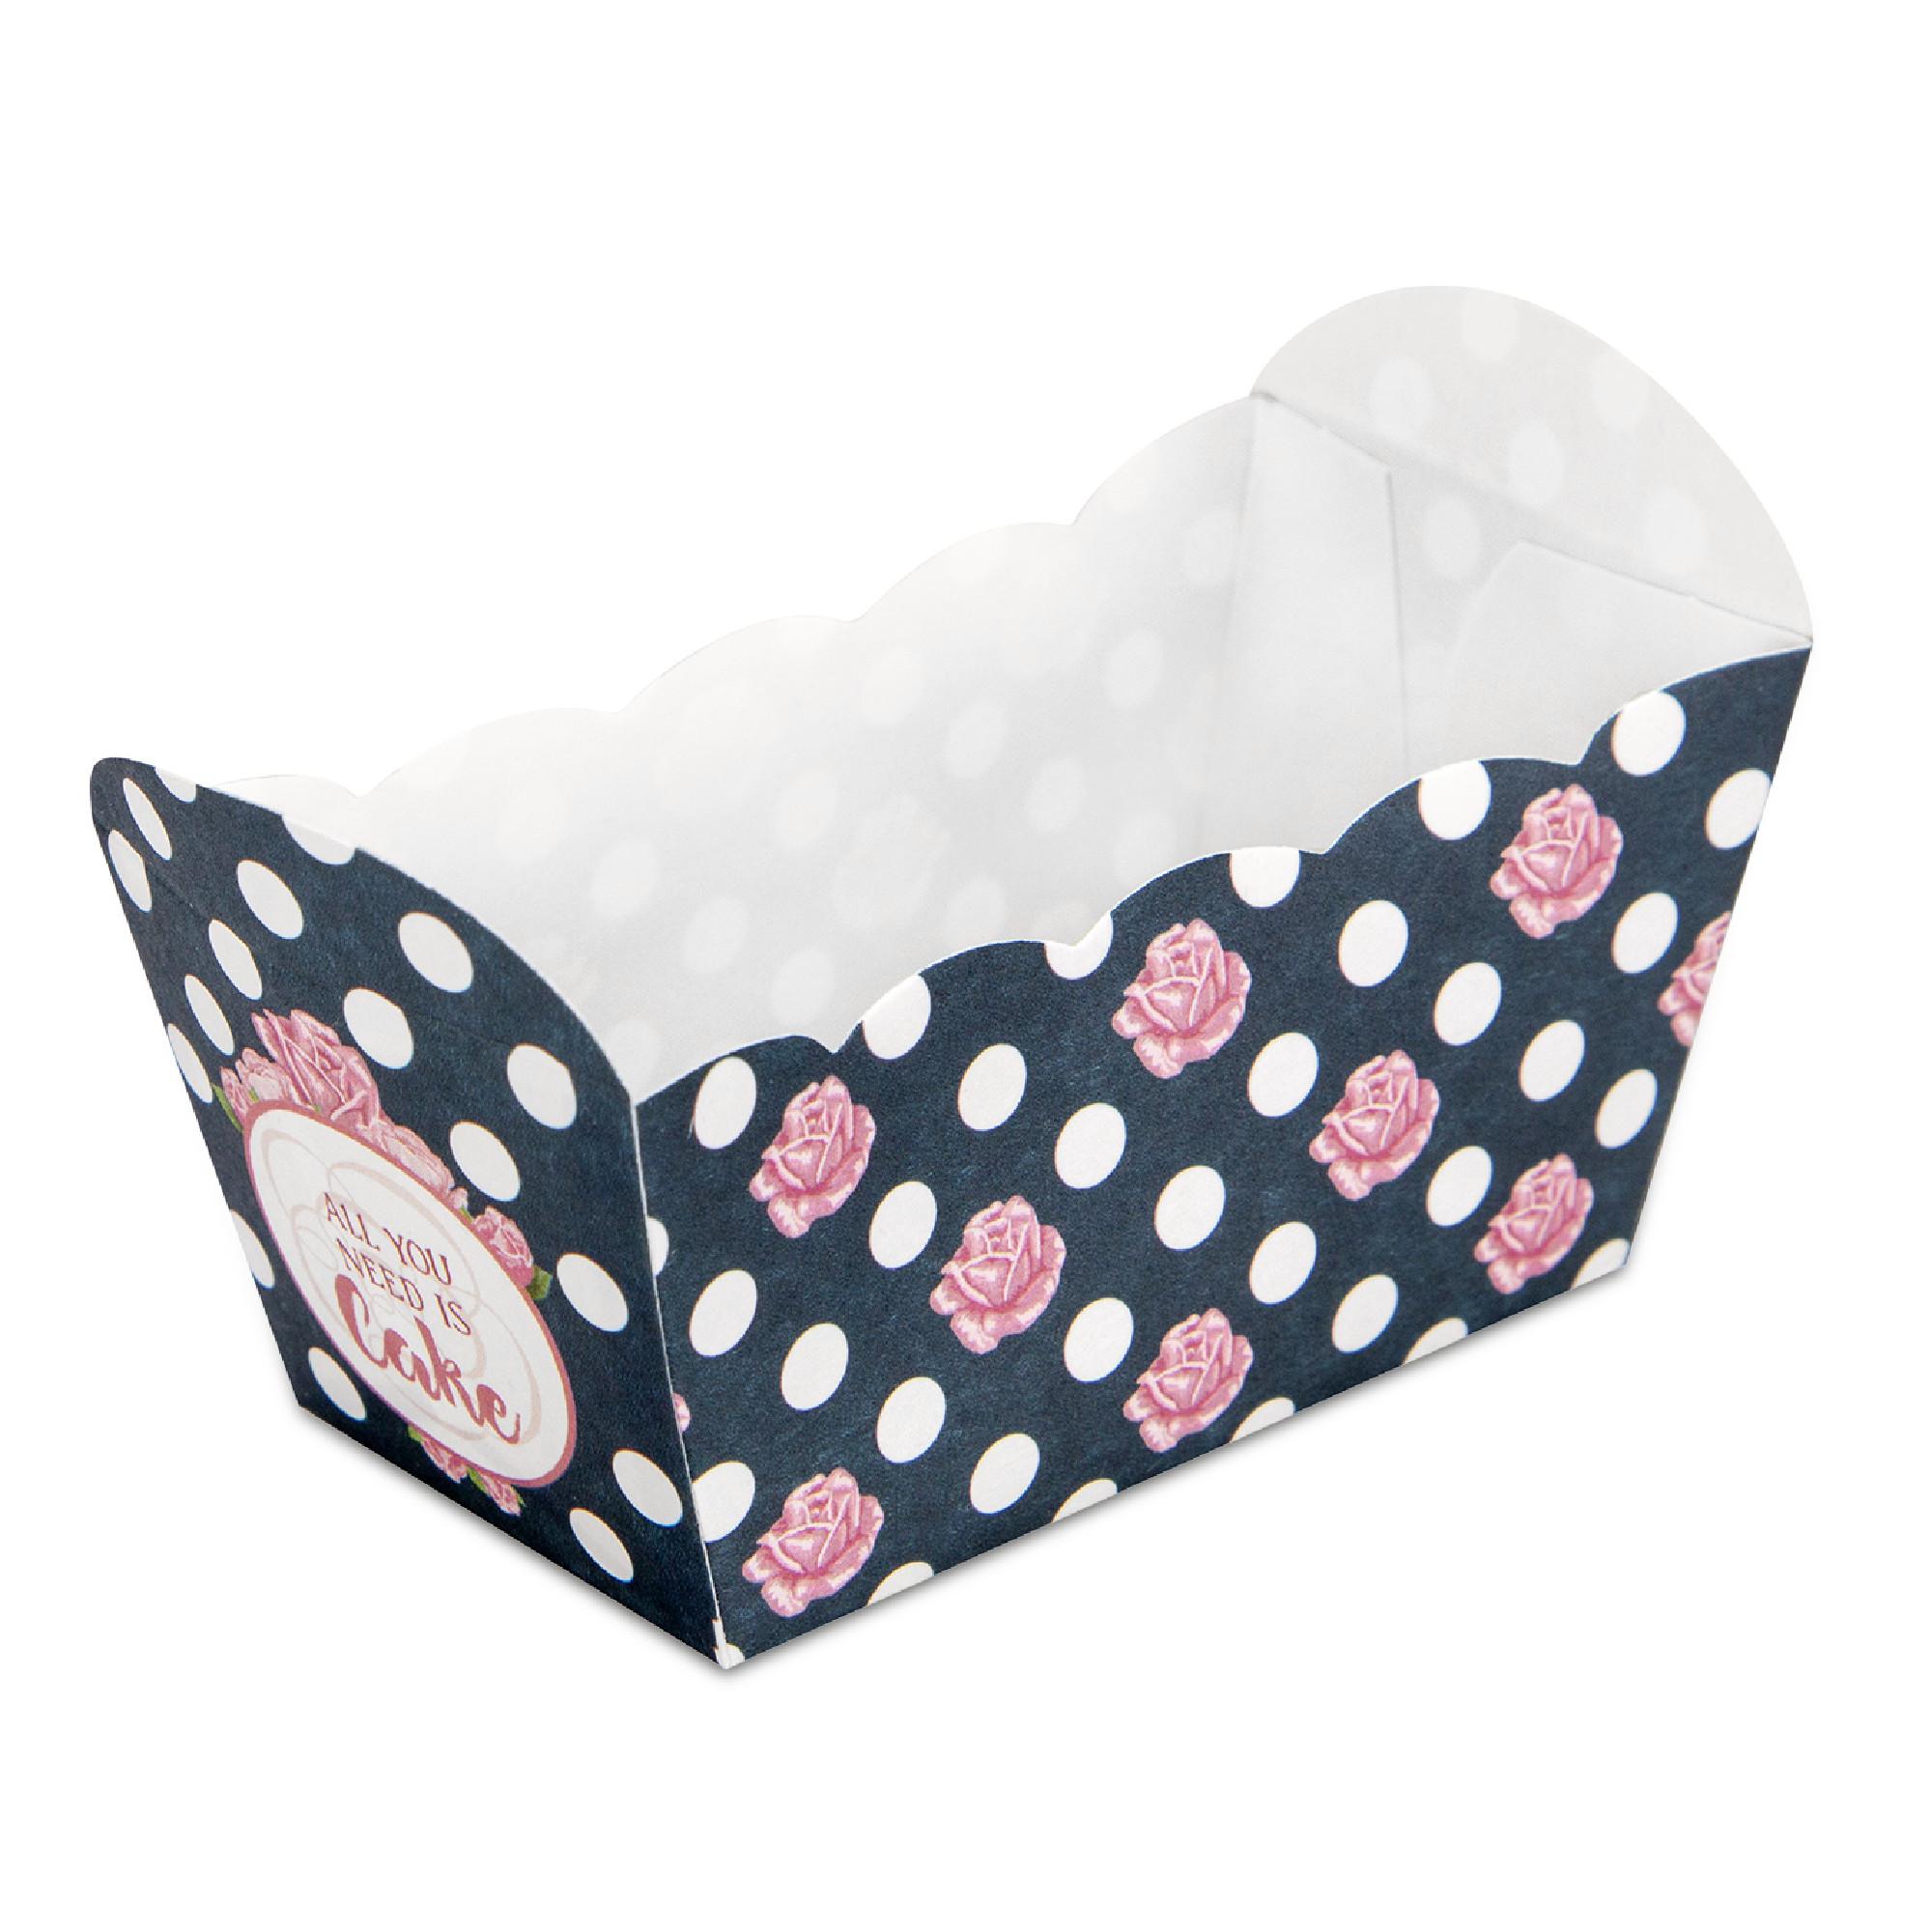 Papier Backform All you Need is a Cake 10 Stück